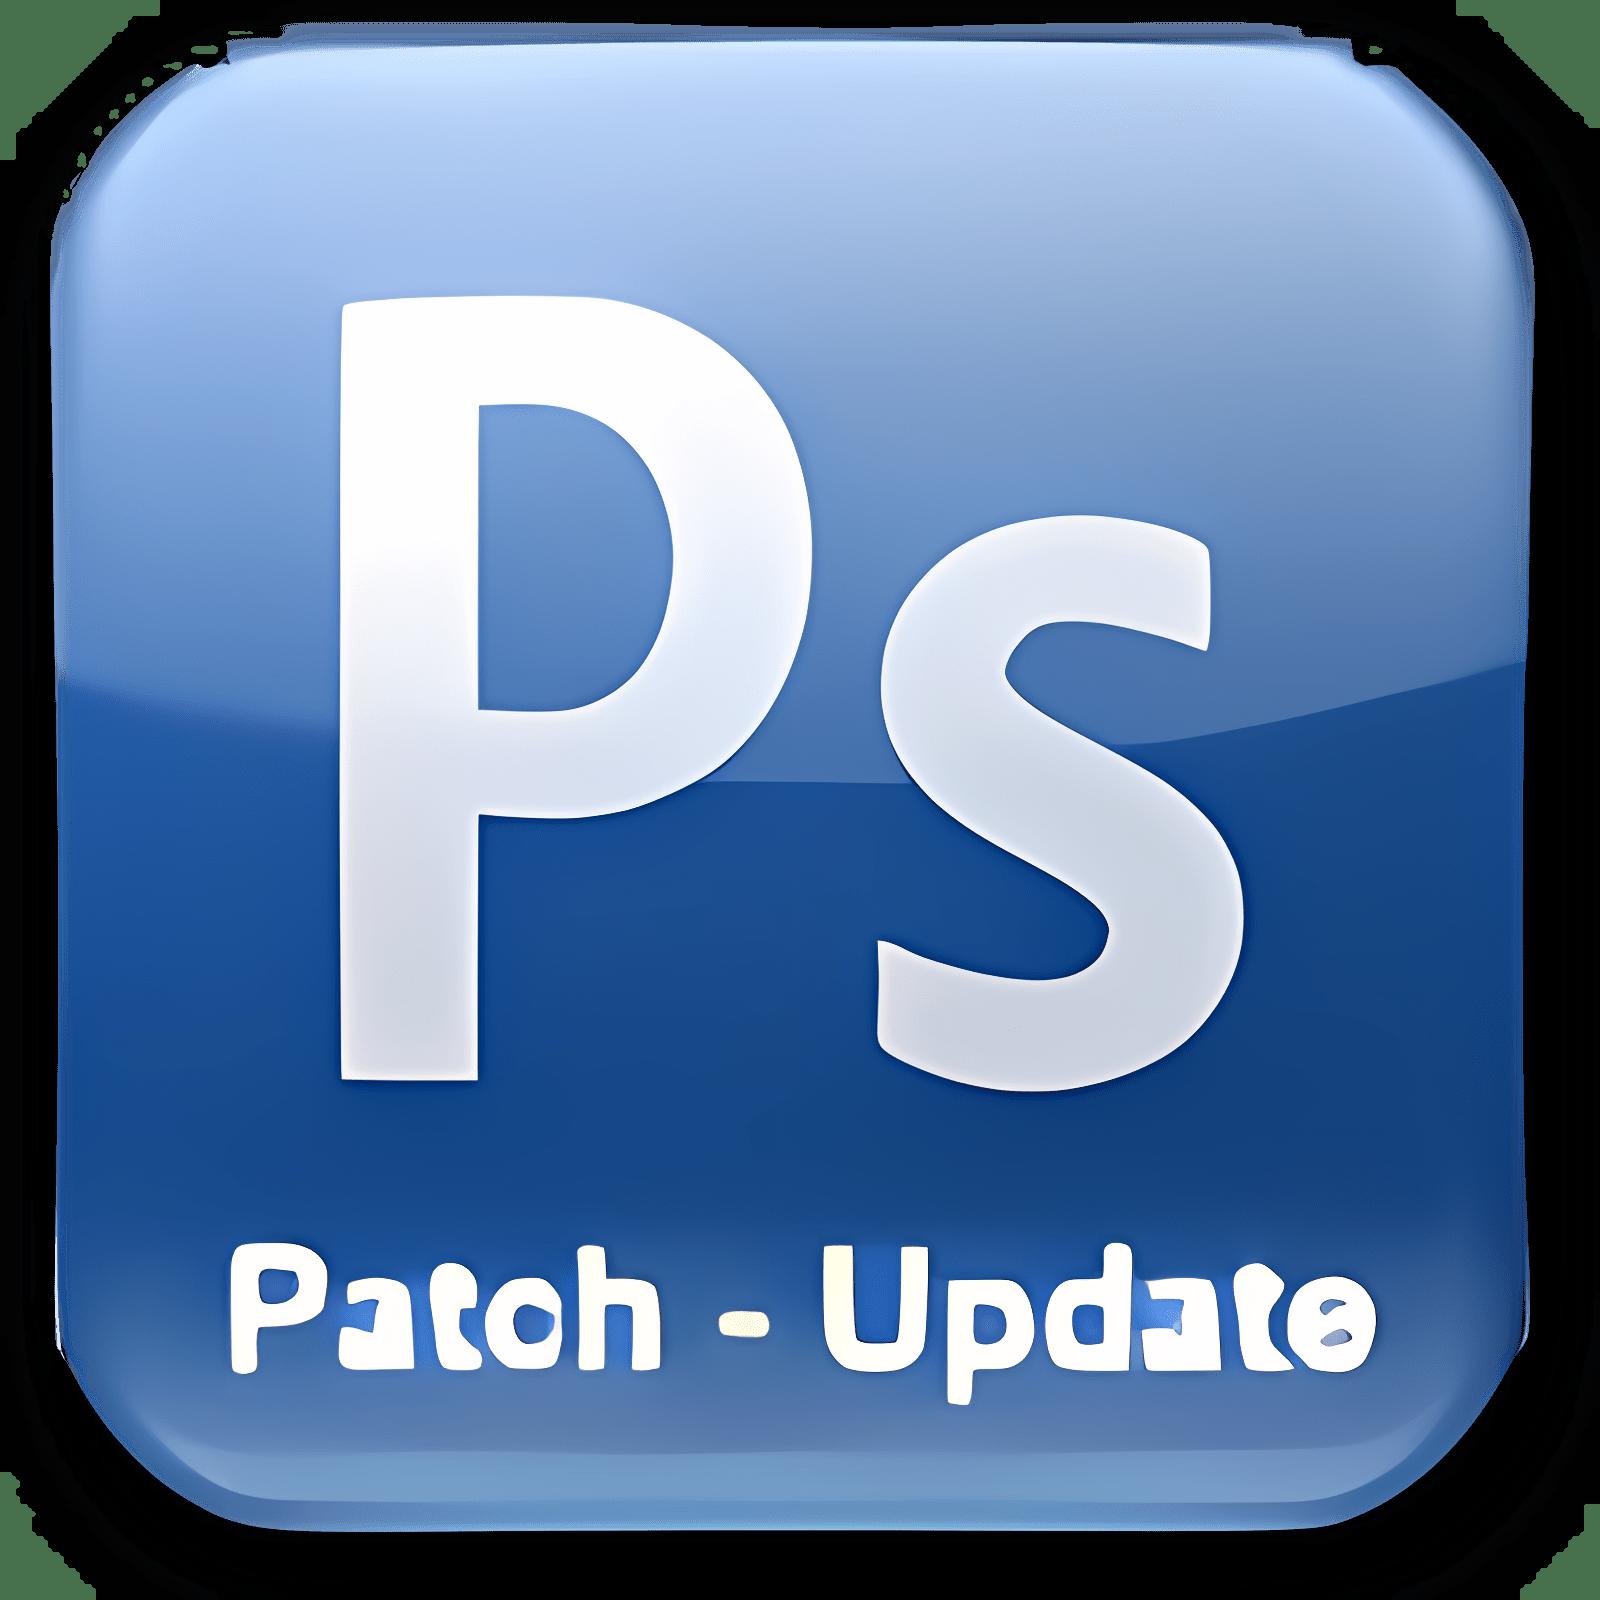 Adobe Photoshop CS5 update 12.0.4